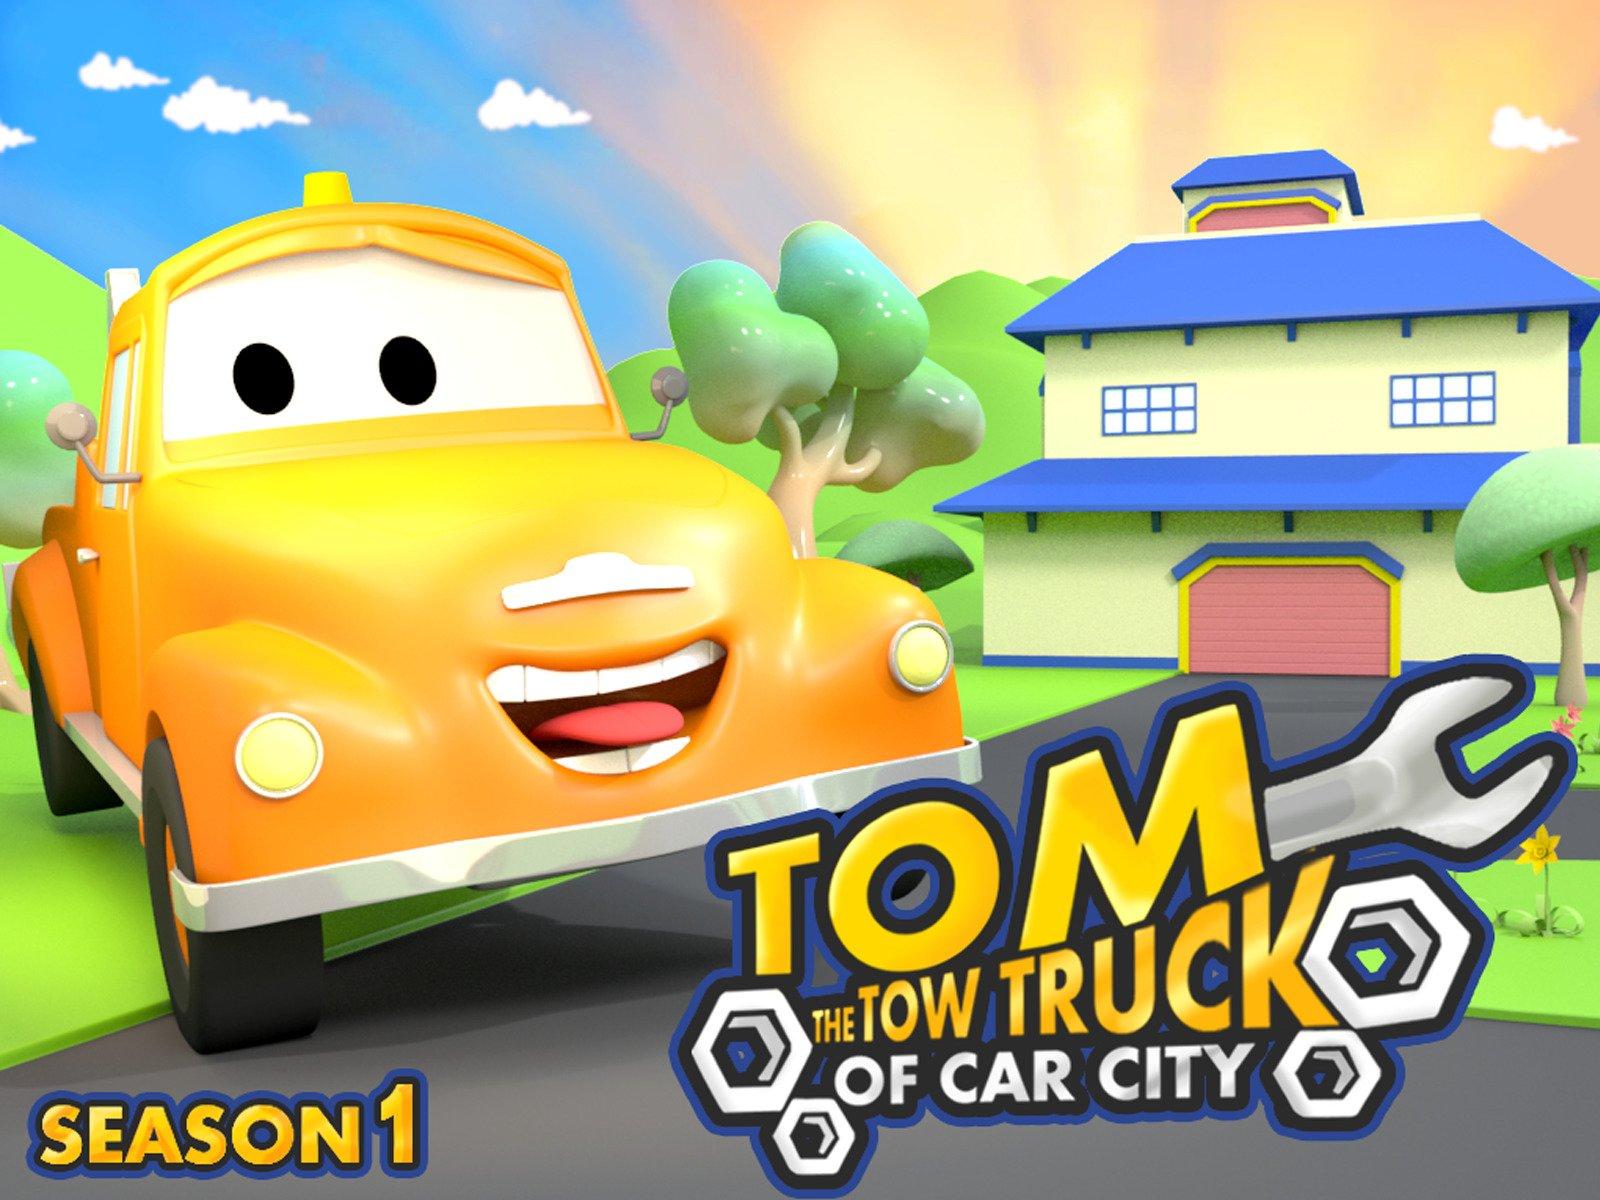 Amazon.com: Tom the Tow Truck of Car City: Malina Germanova, Charles Courcier, Edouard Desmettre, Arthur Lener